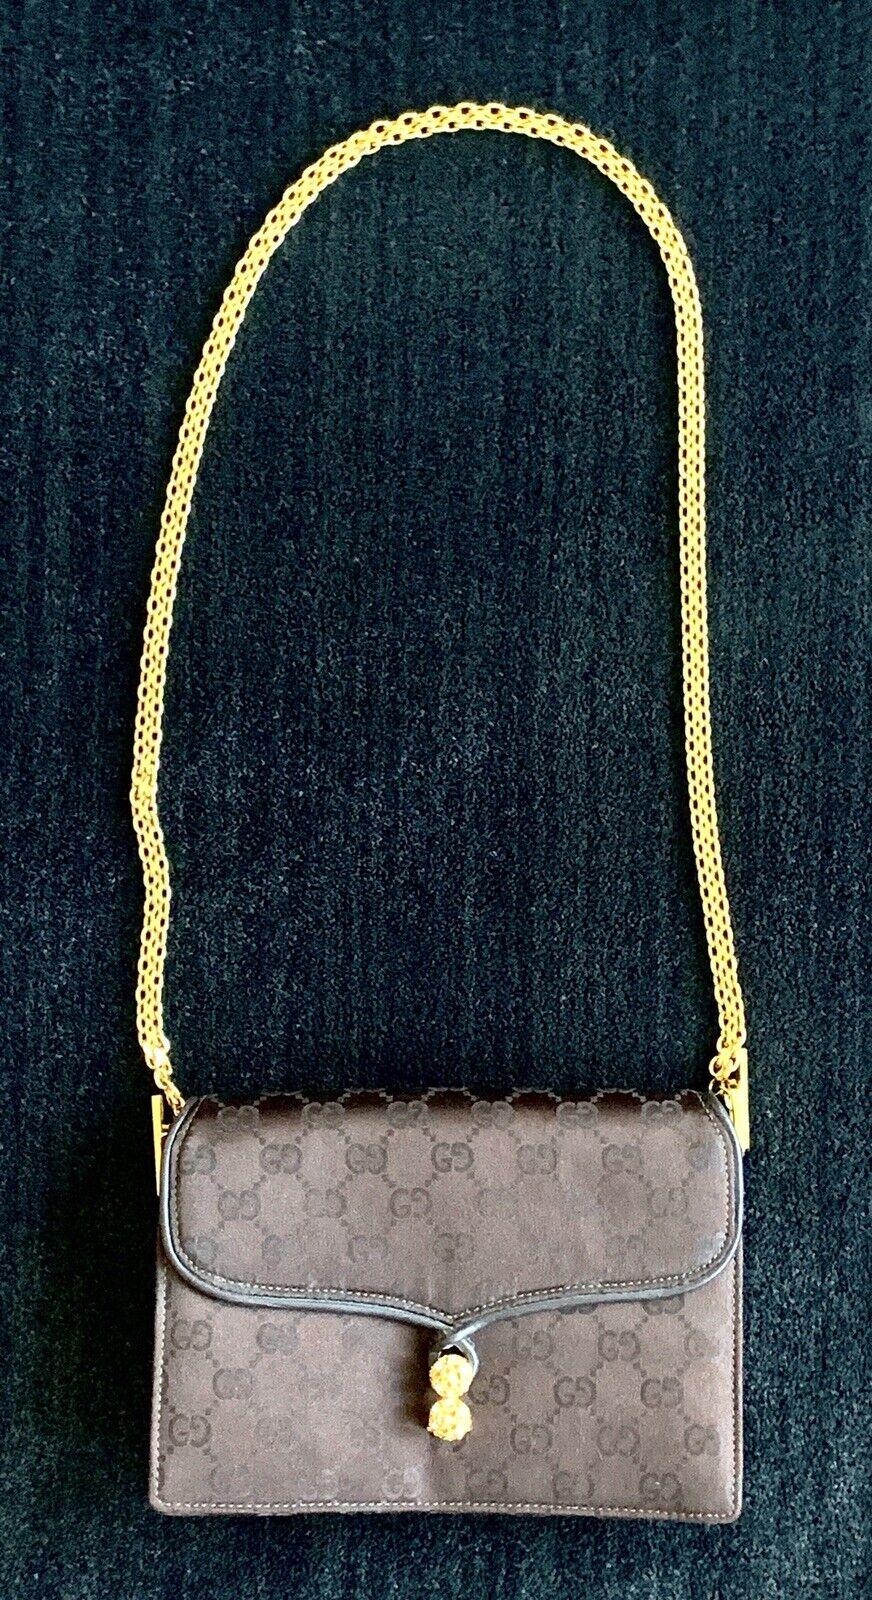 Gucci Vintage Classic Handbag with original box  - image 5